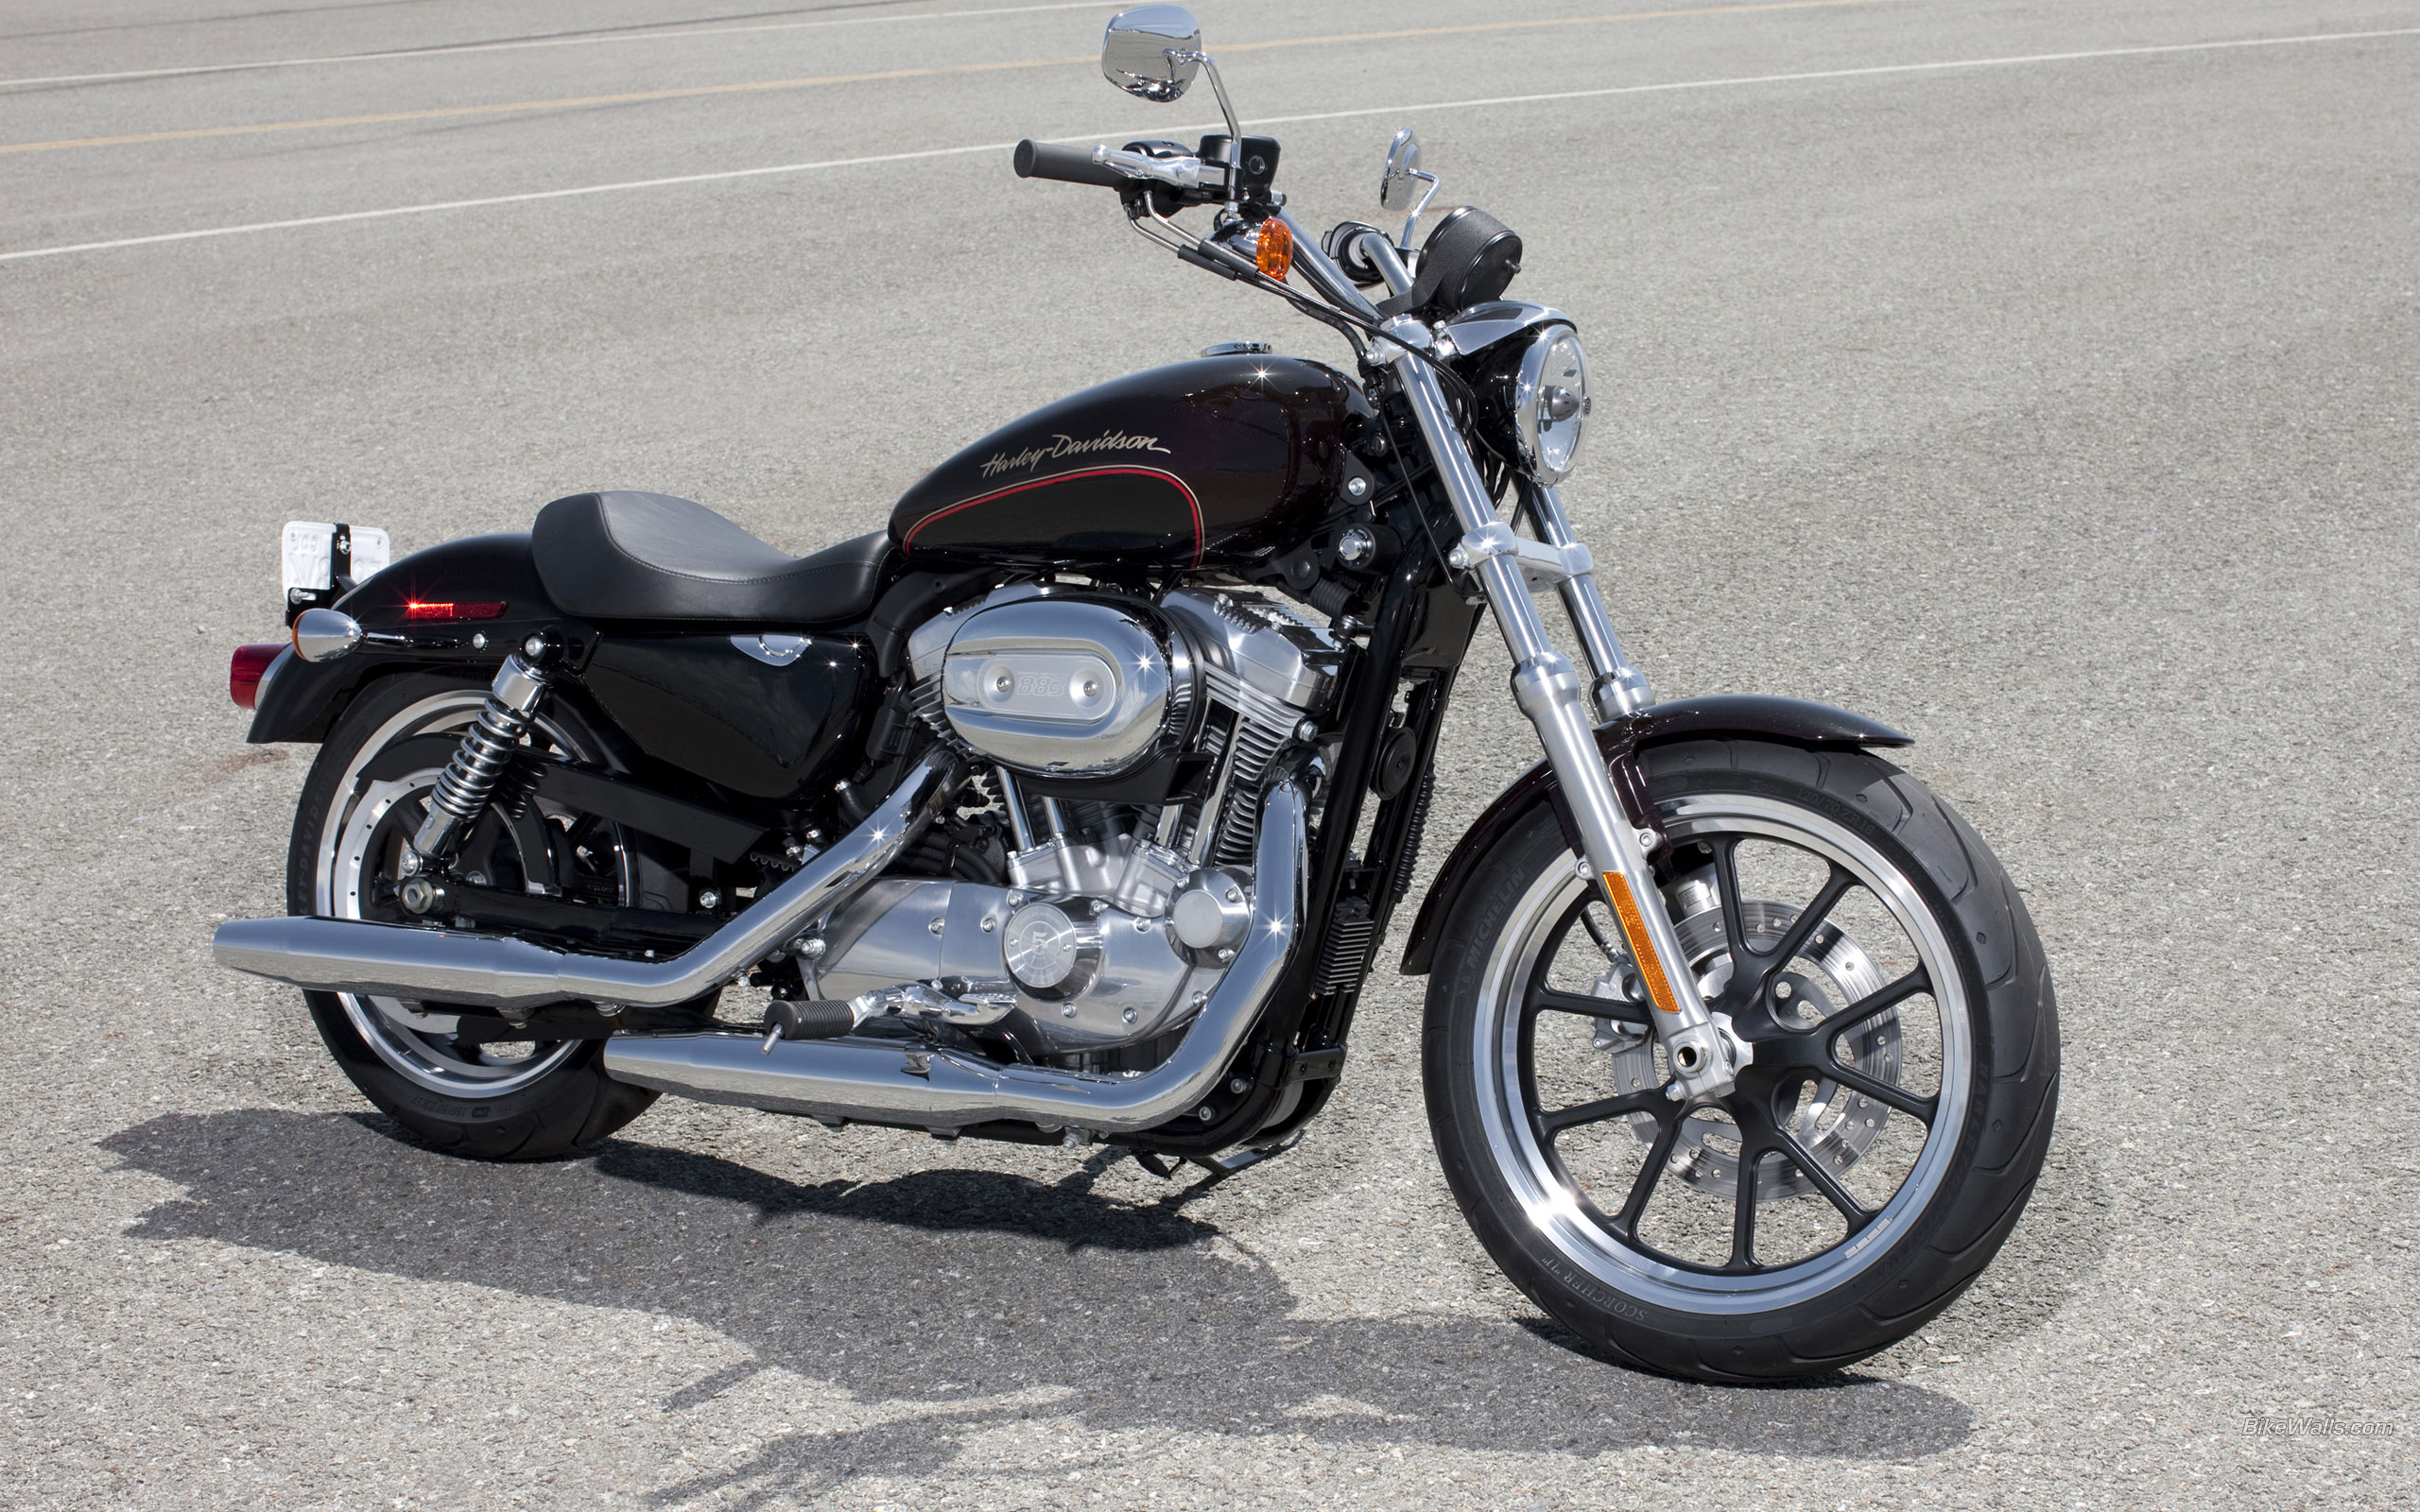 Harley Davidson Sportster SuperLow XL883L 2560 x 1600 Download 2560x1600